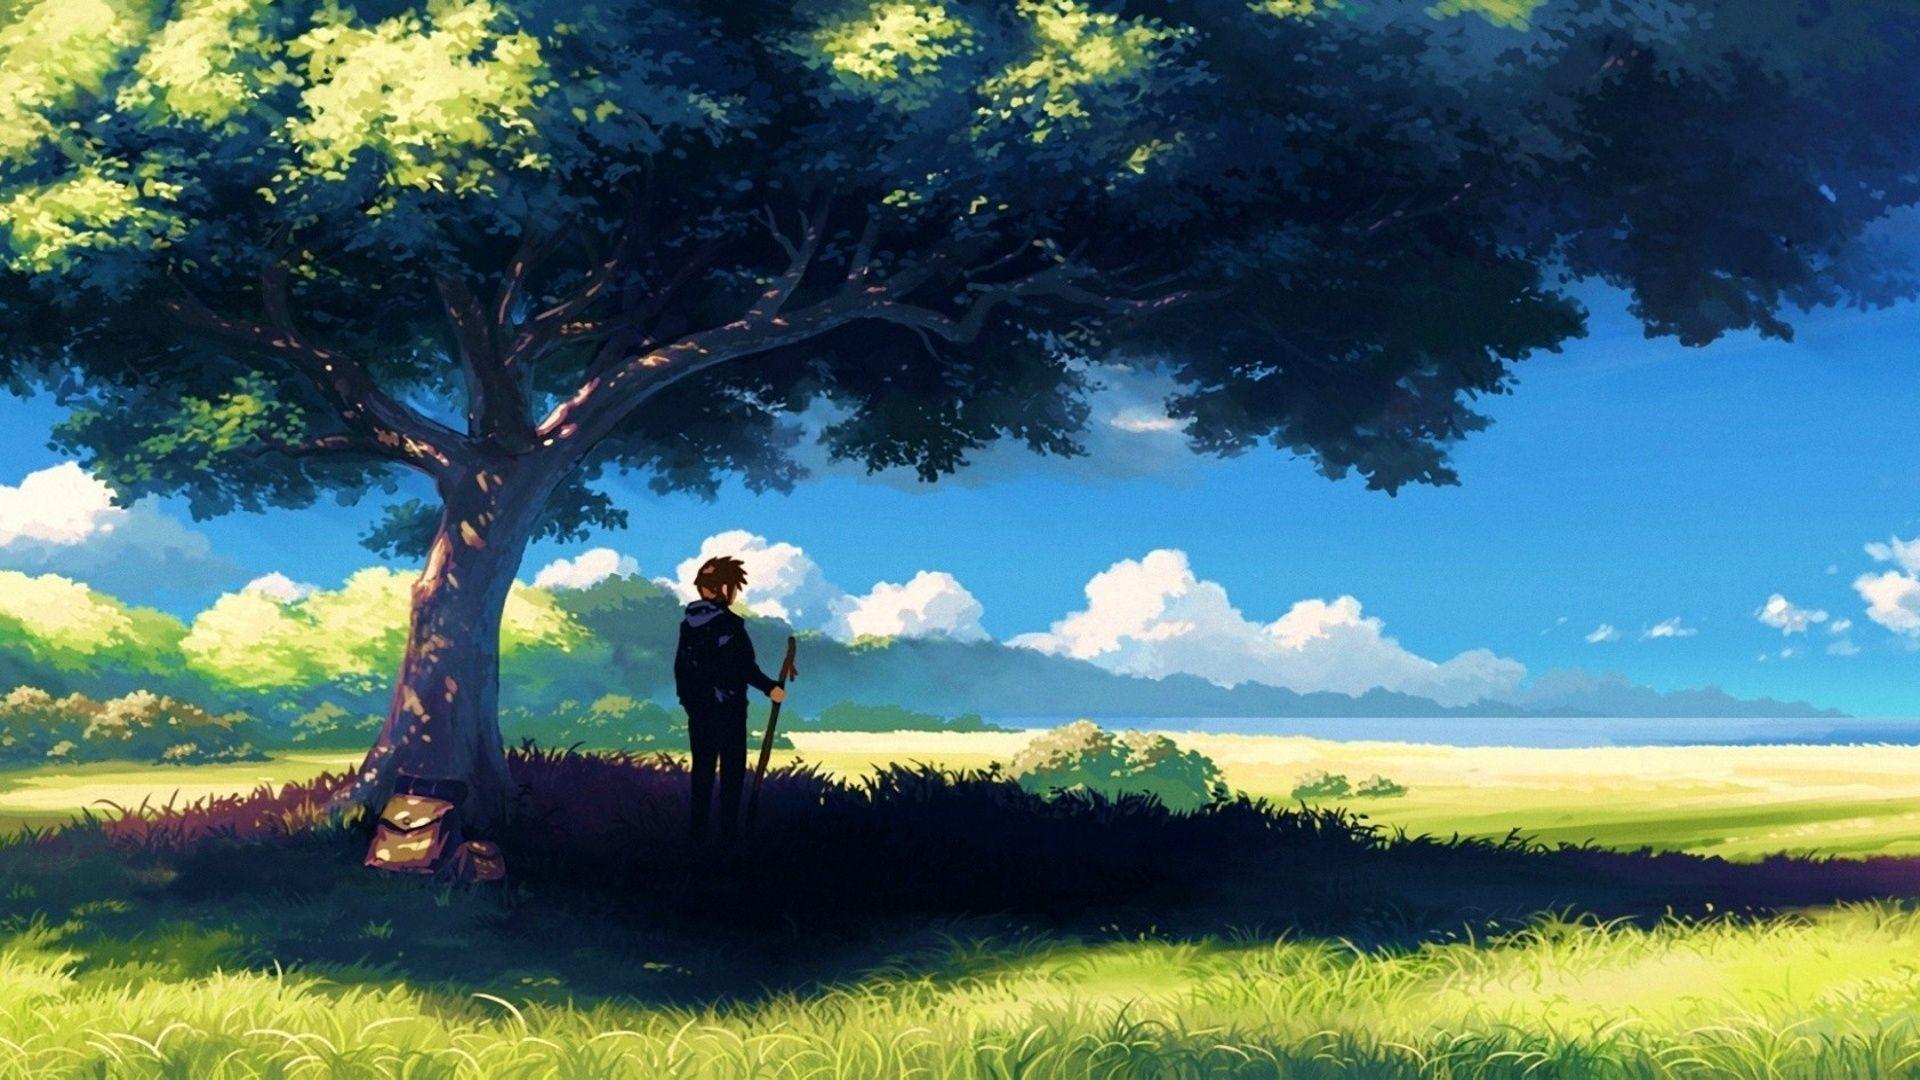 1920x1080 anime, scenery, boy under tree, anime scenery wallpapers